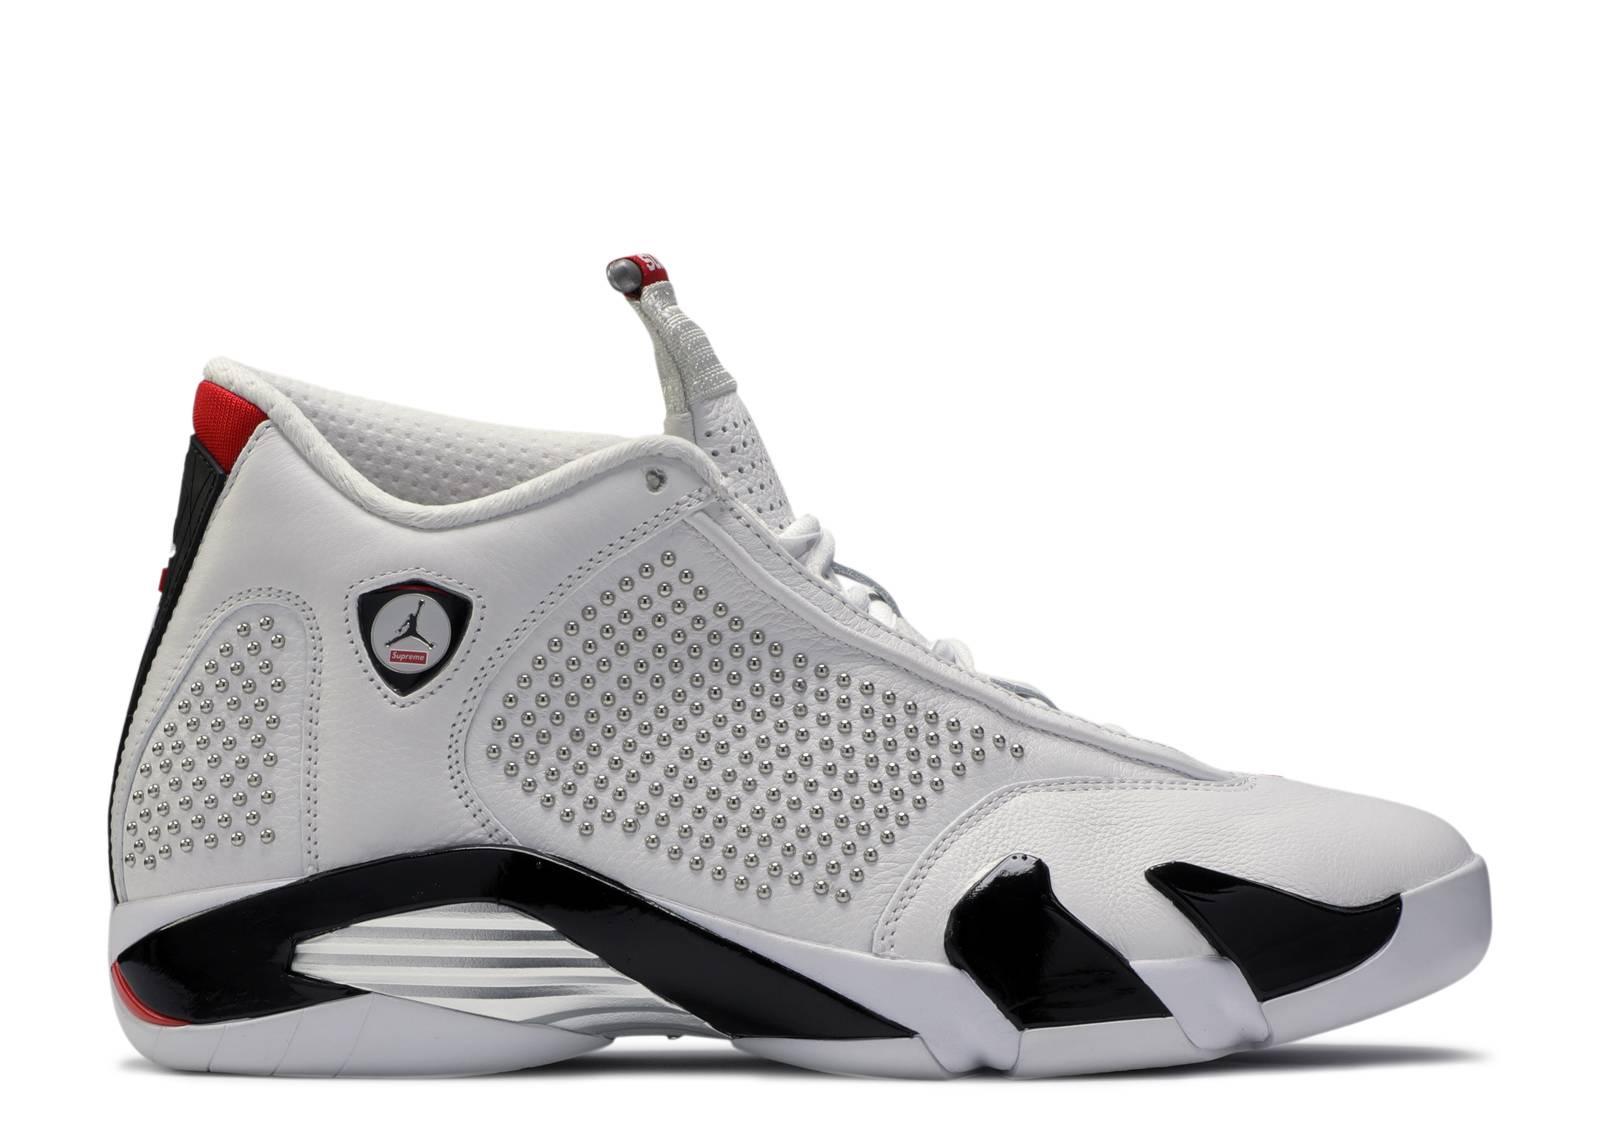 capítulo esponja Exclusivo  Supreme X Air Jordan 14 Retro 'White' - Air Jordan - BV7630 106 -  white/university red/black | Flight Club